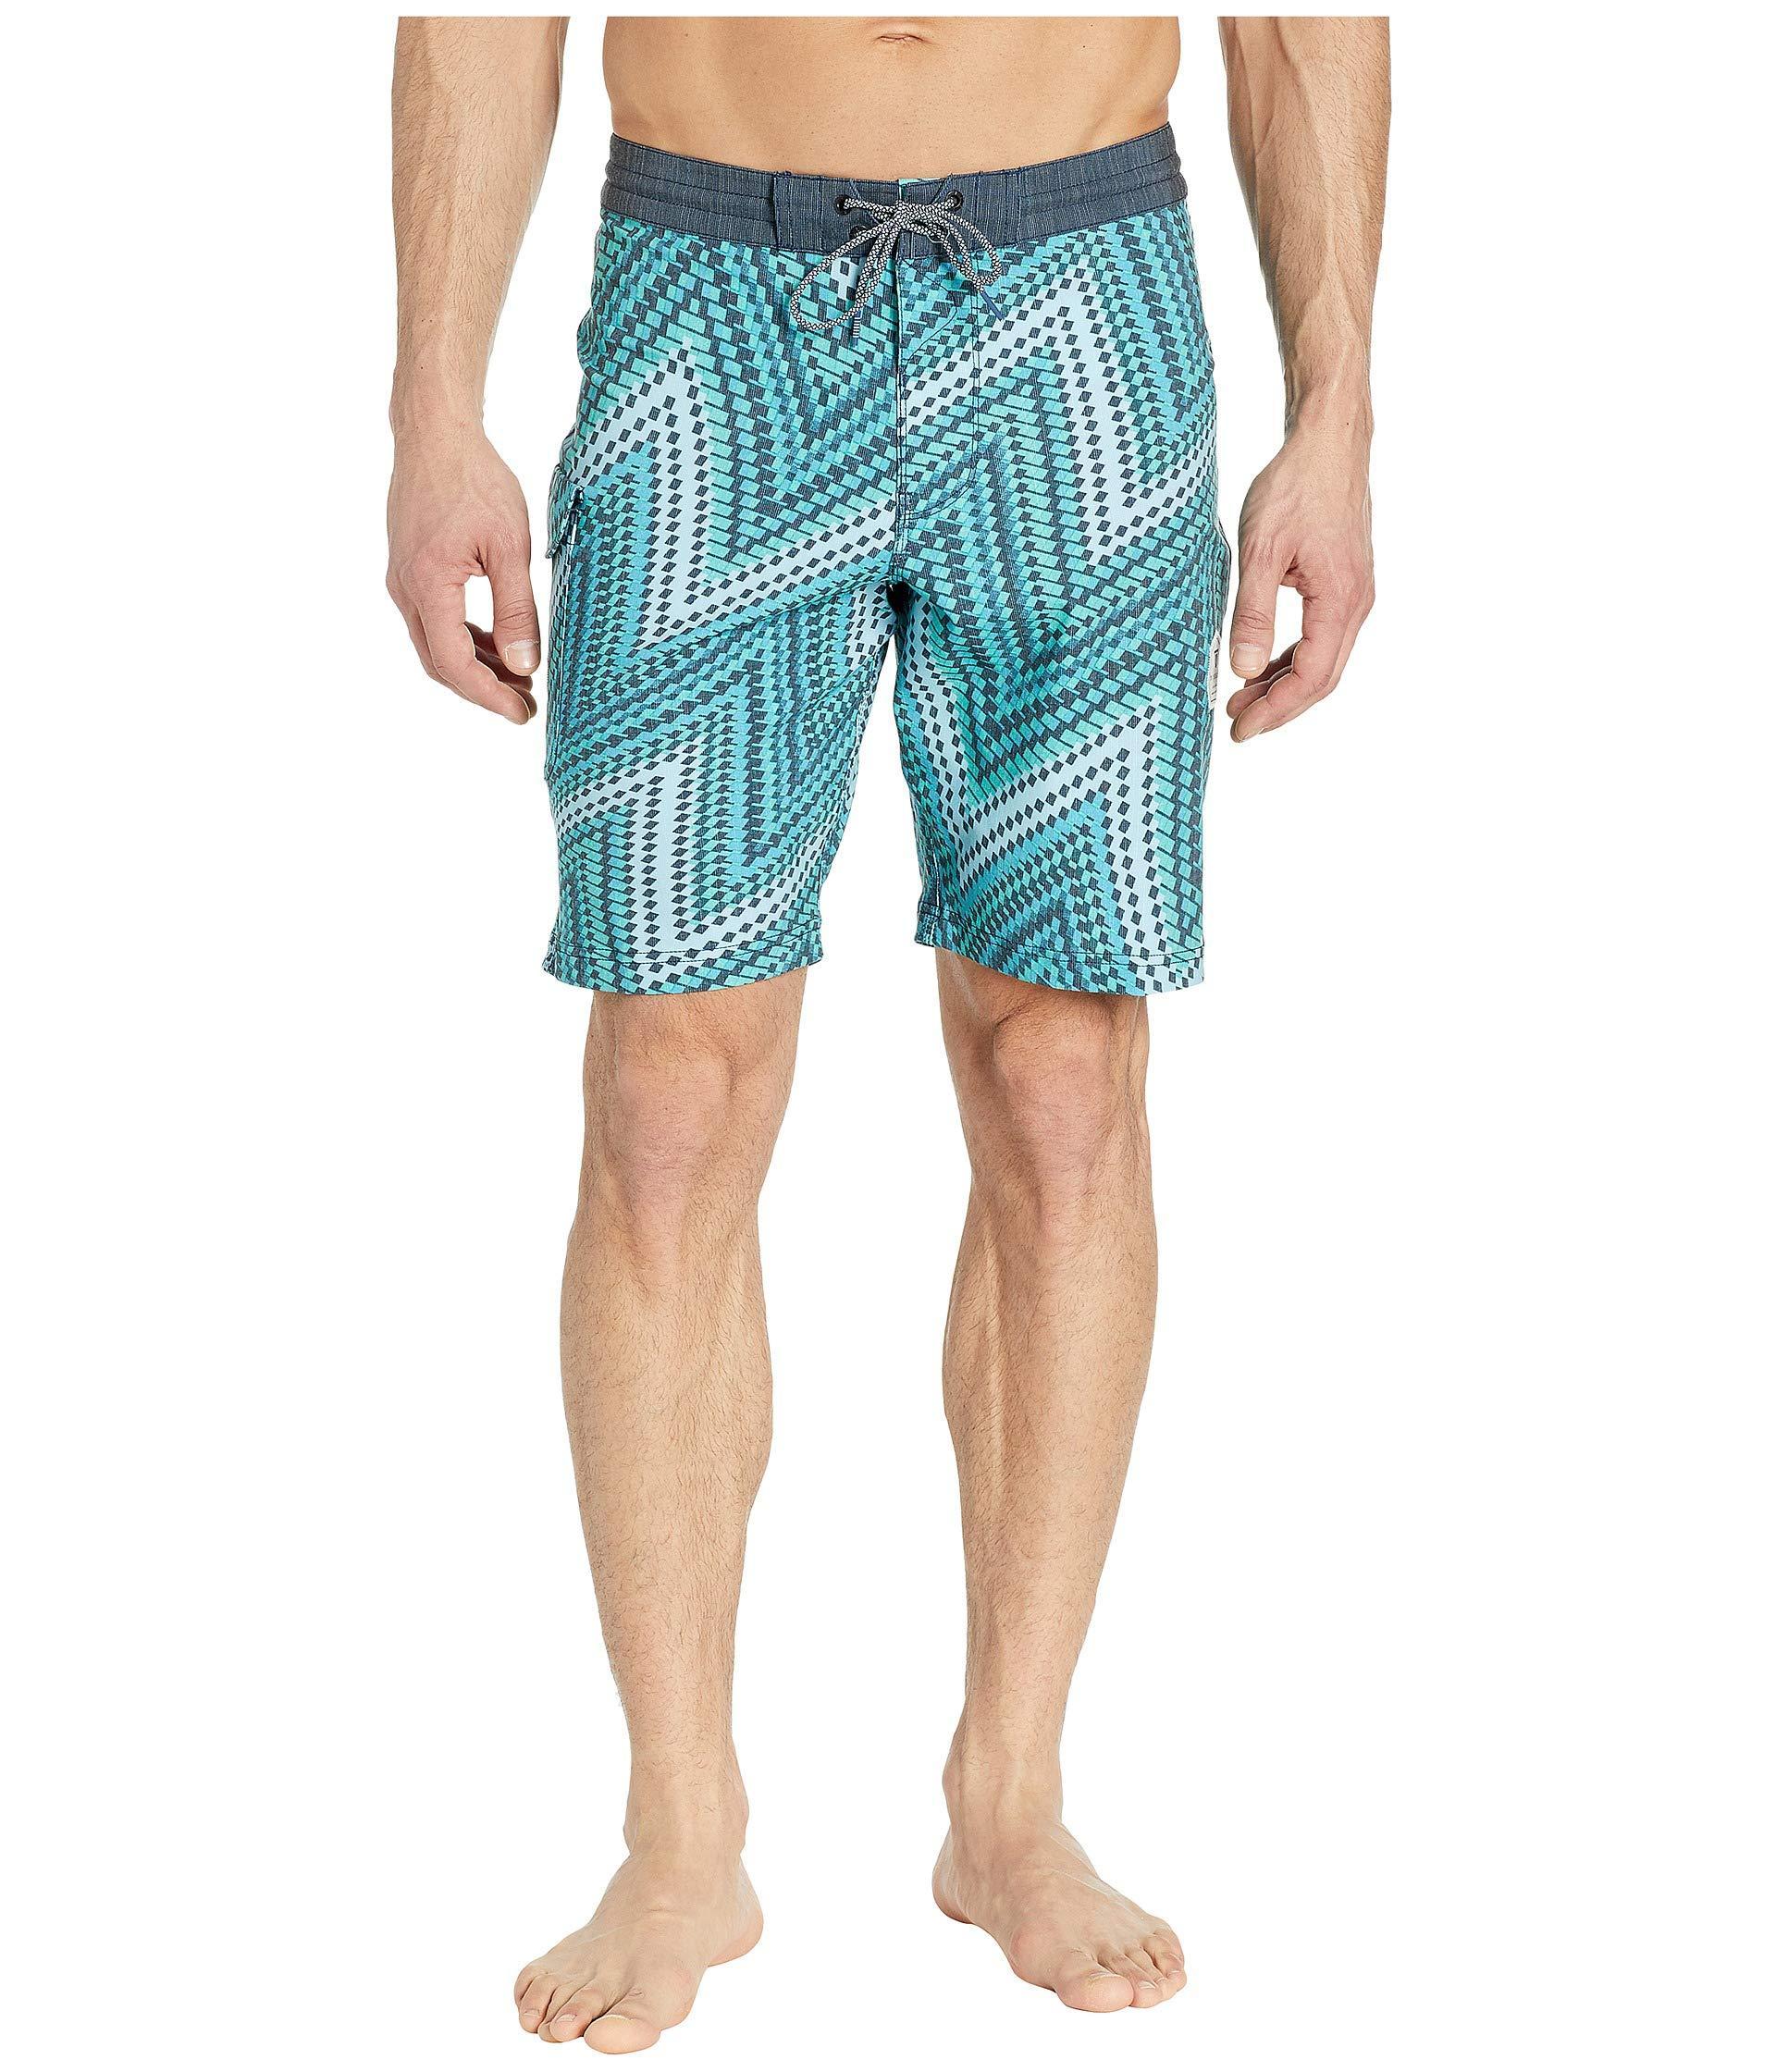 5d175673da Lyst - Vissla 20 Del Mar Swim Shorts (cool Blue) Men's Swimwear in ...